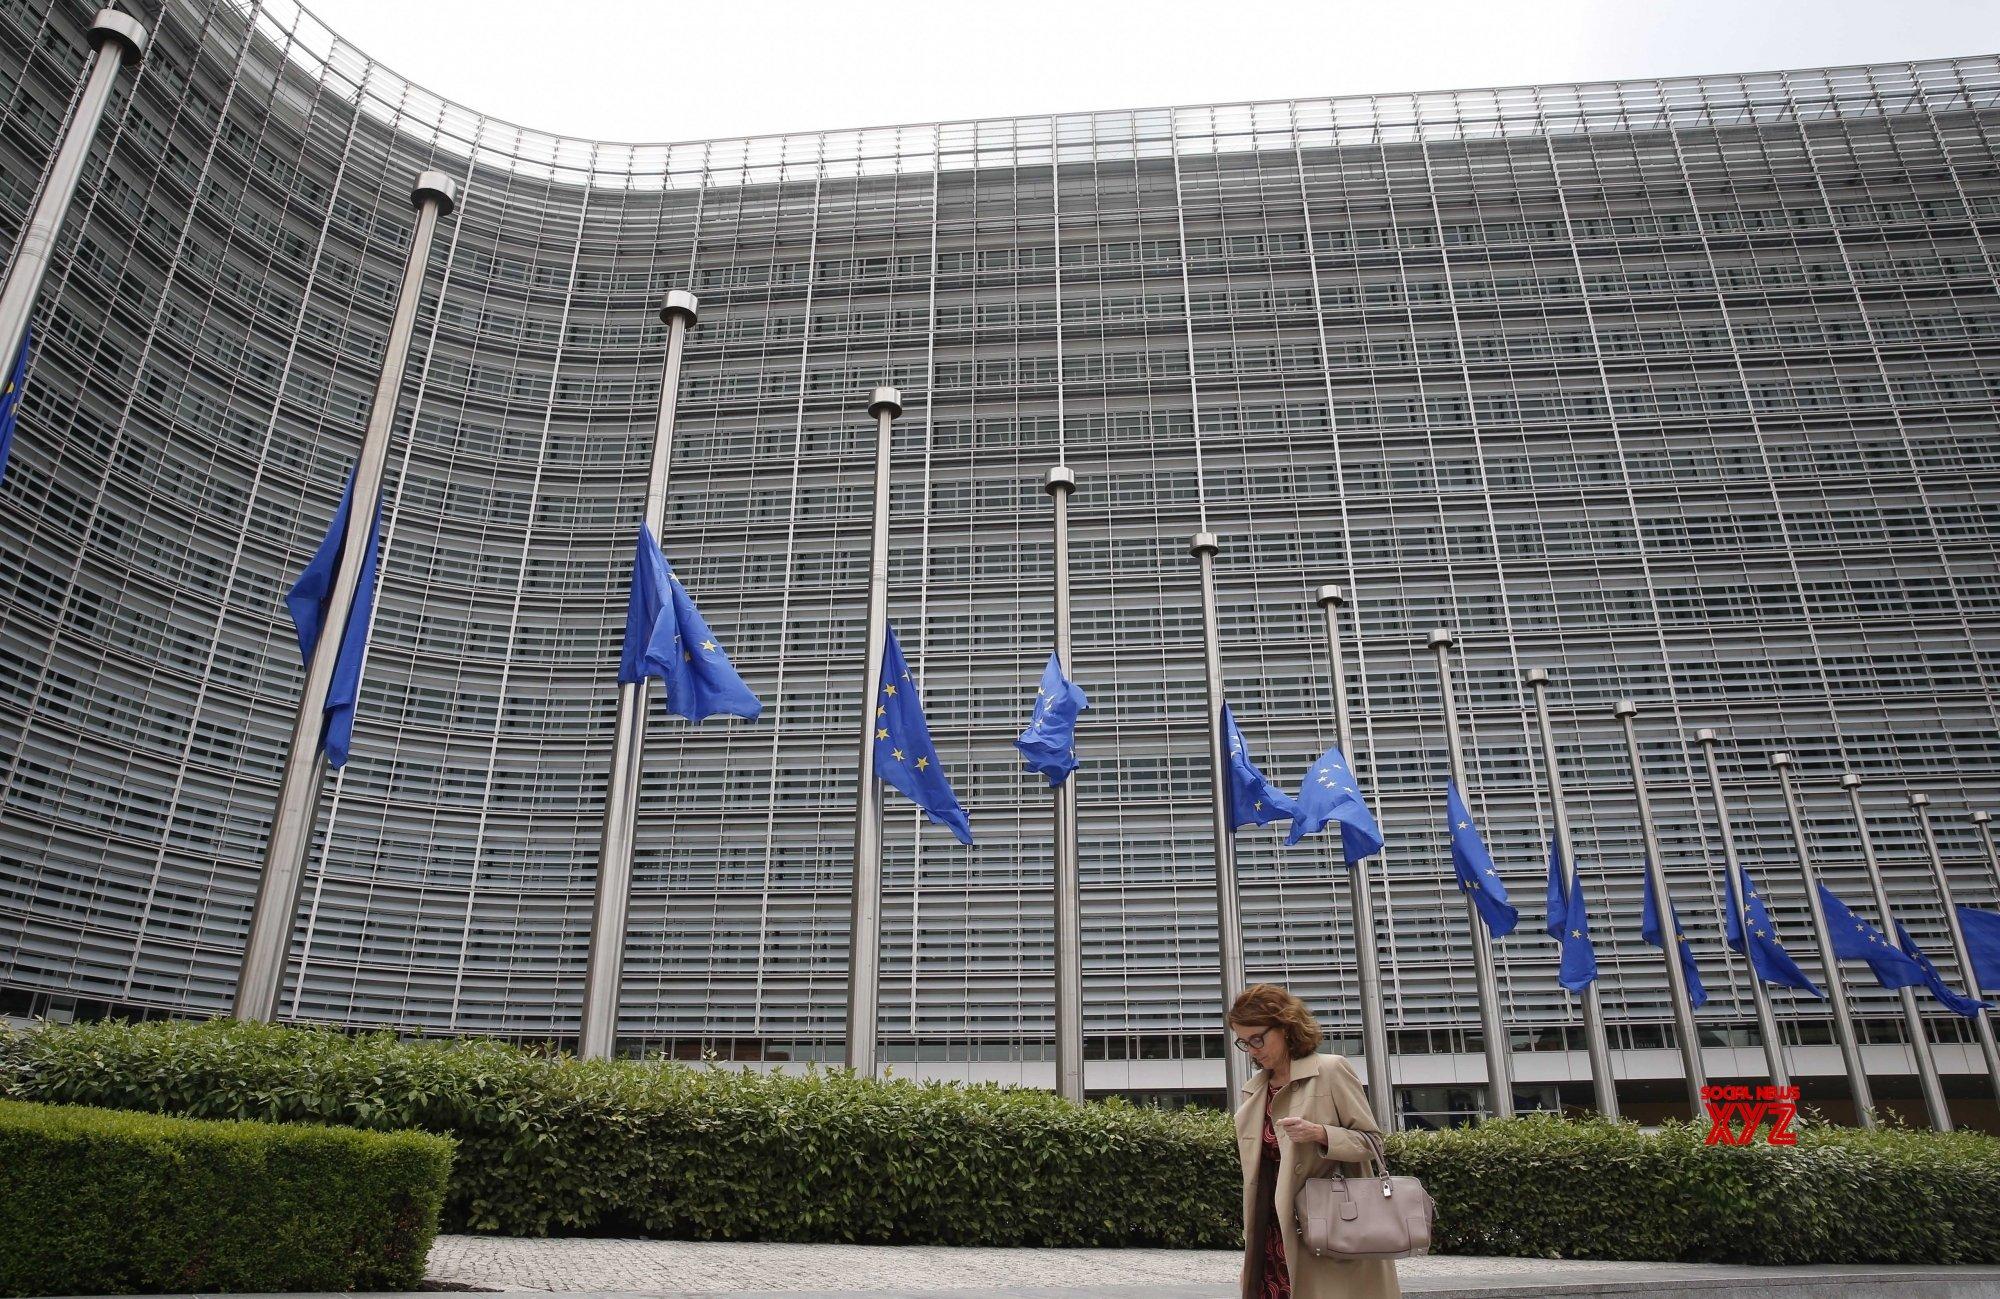 EU suspends PIA for six months over fake pilot licence scam